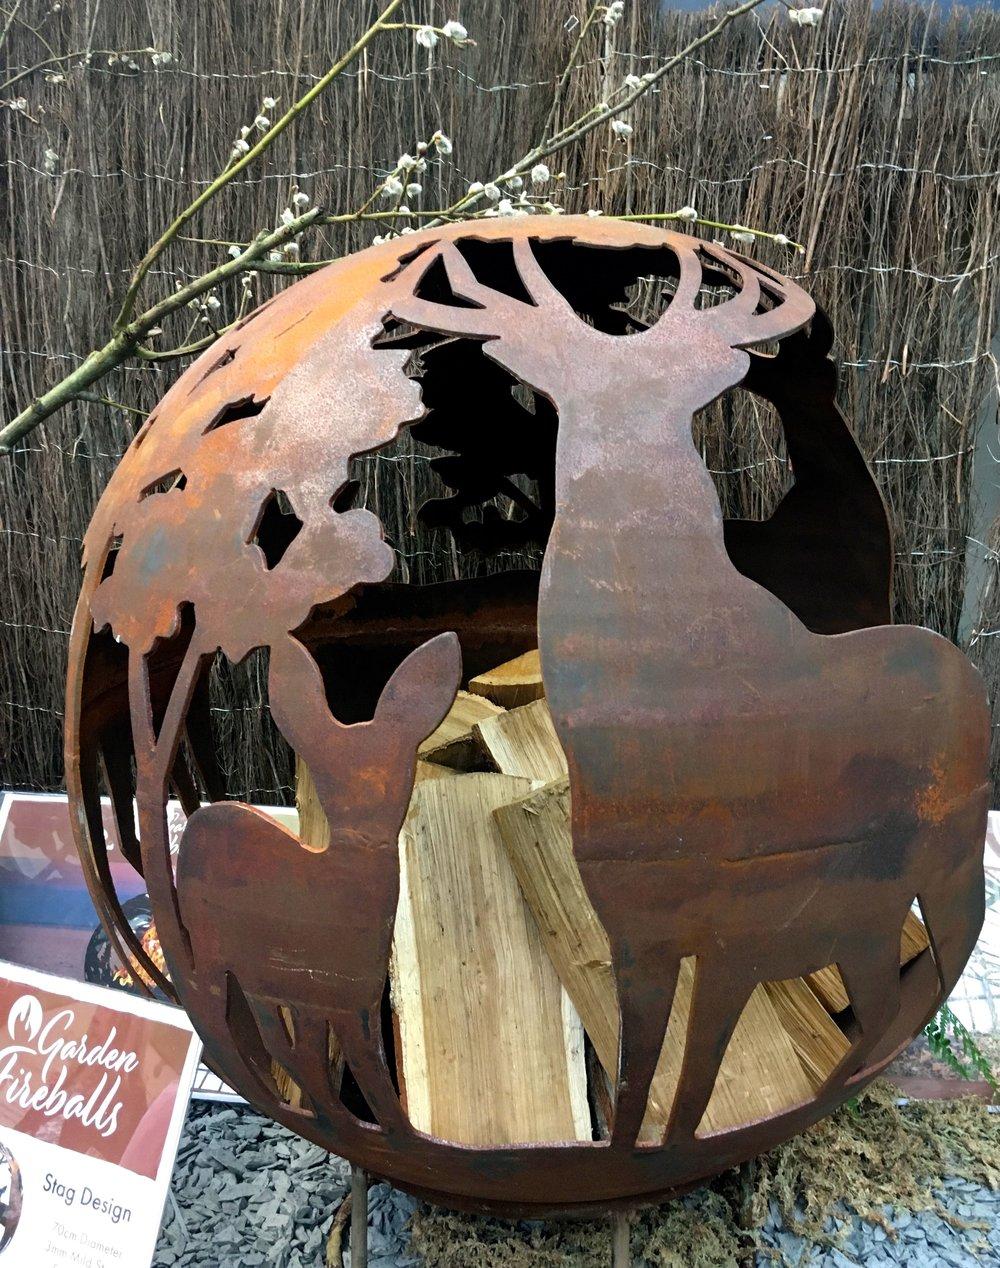 A stag design fireball